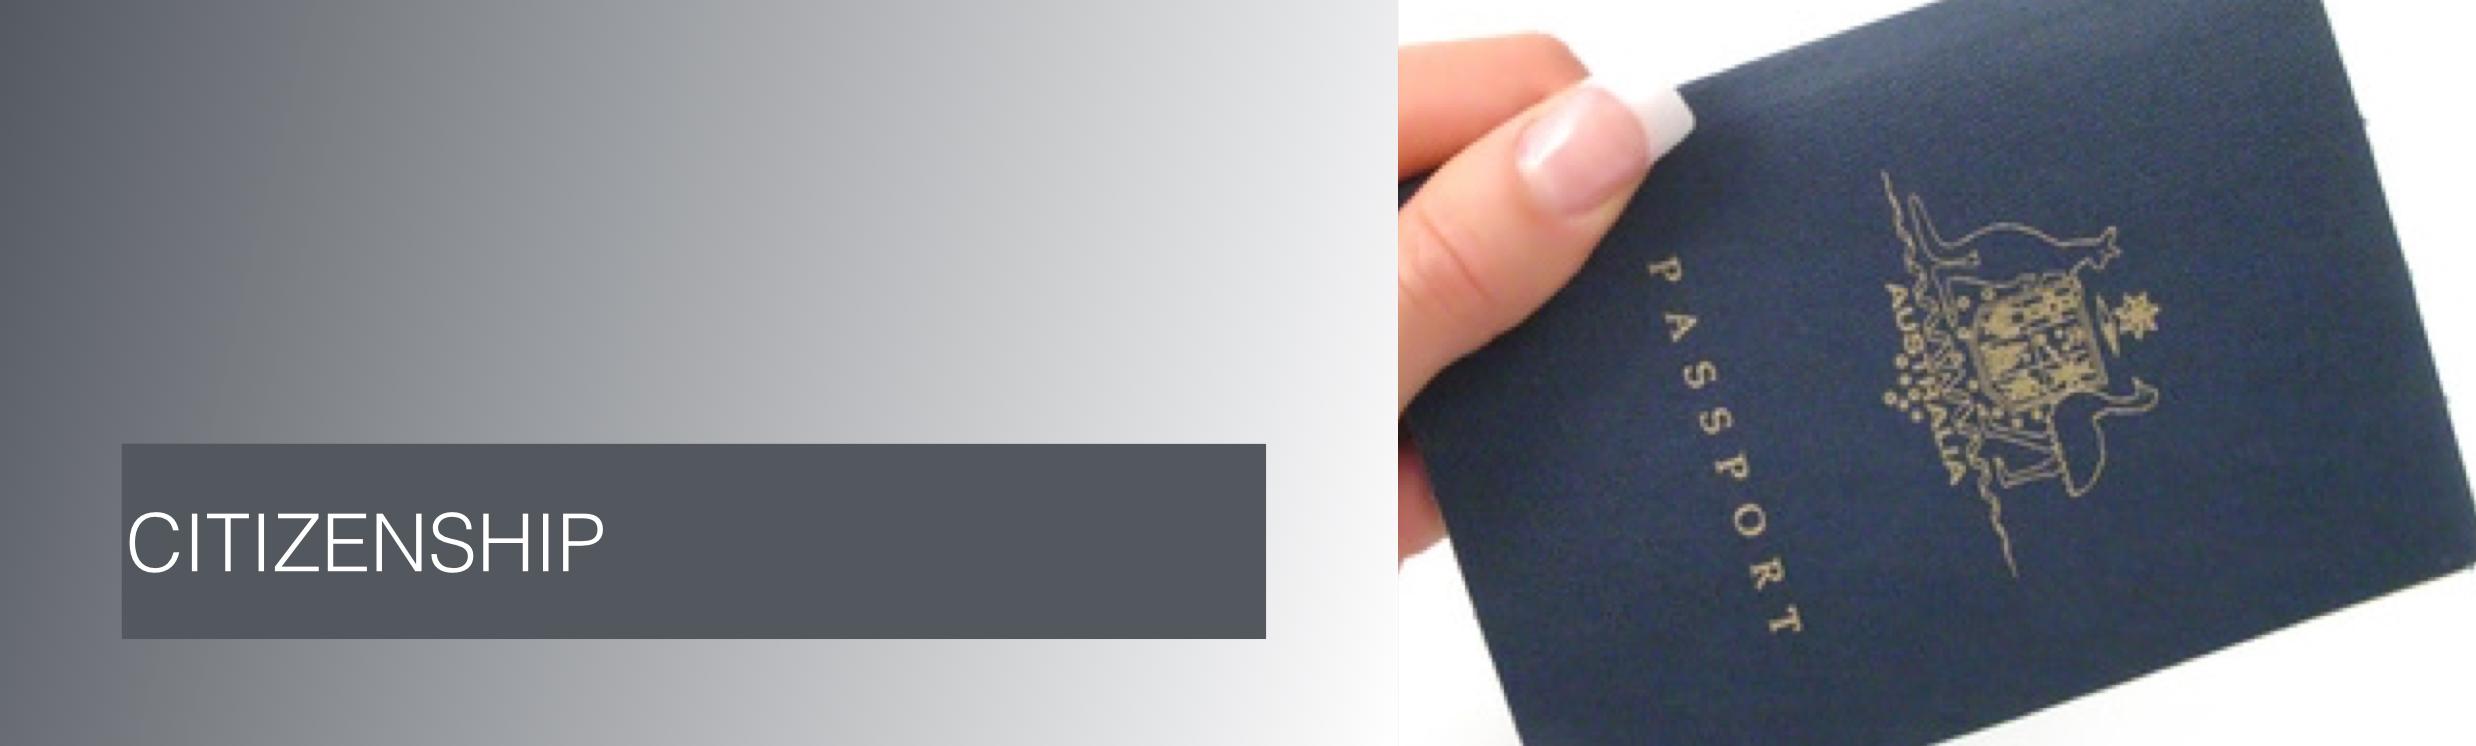 RENU-WEB-CARD-MAIN-SAFE.033